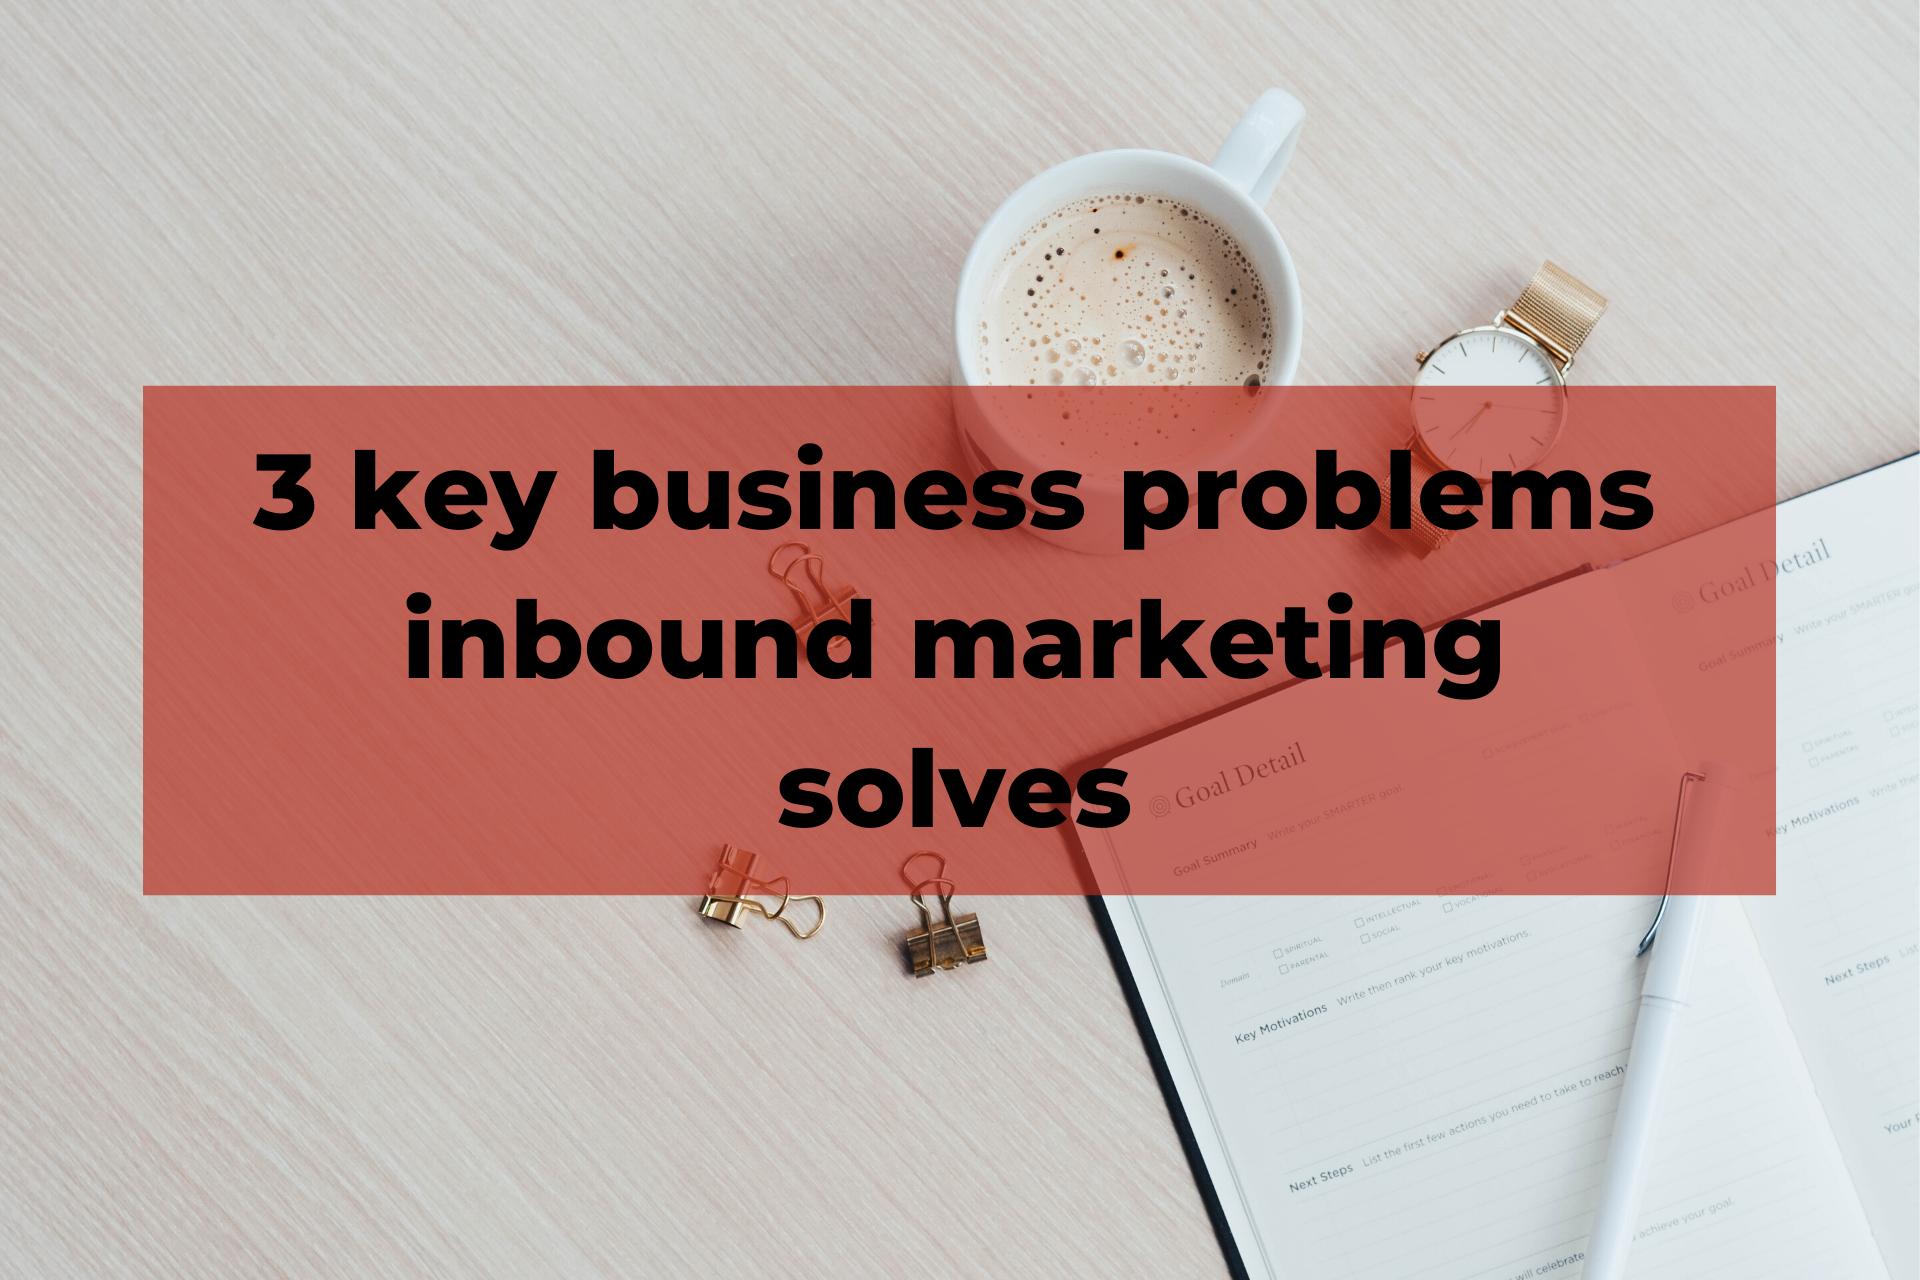 3 key business problems inbound marketing solves